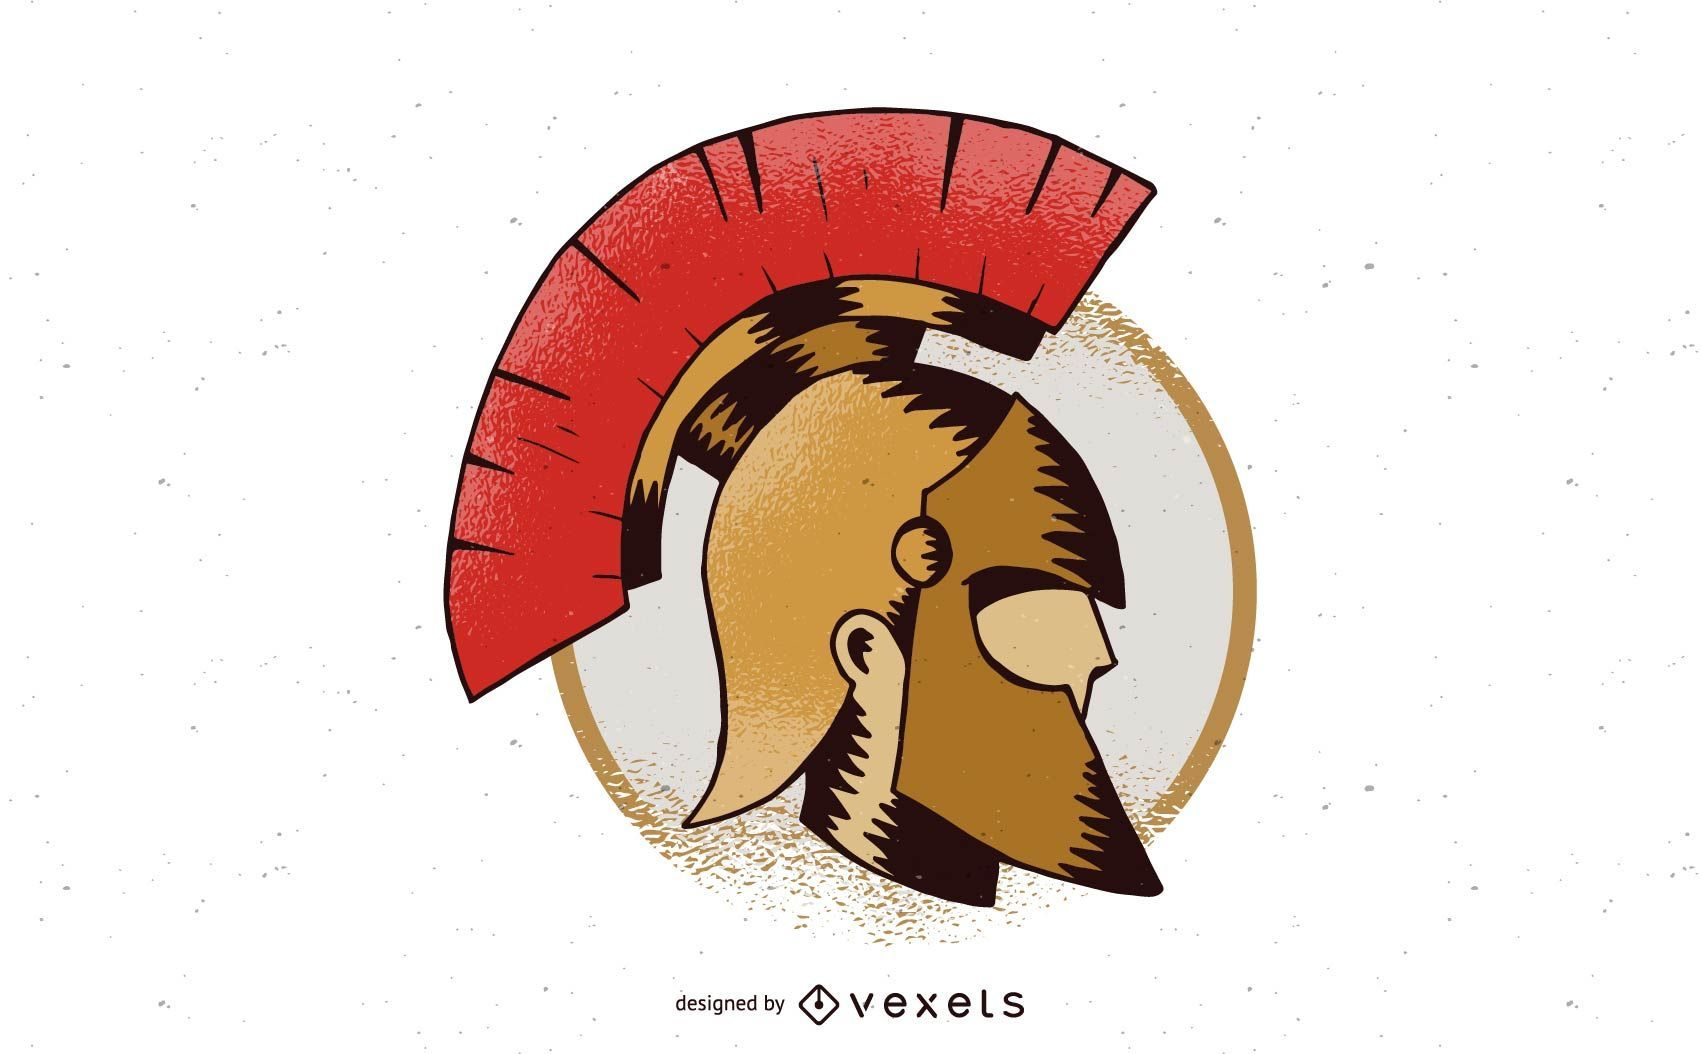 Dise?o de insignia de casco espartano